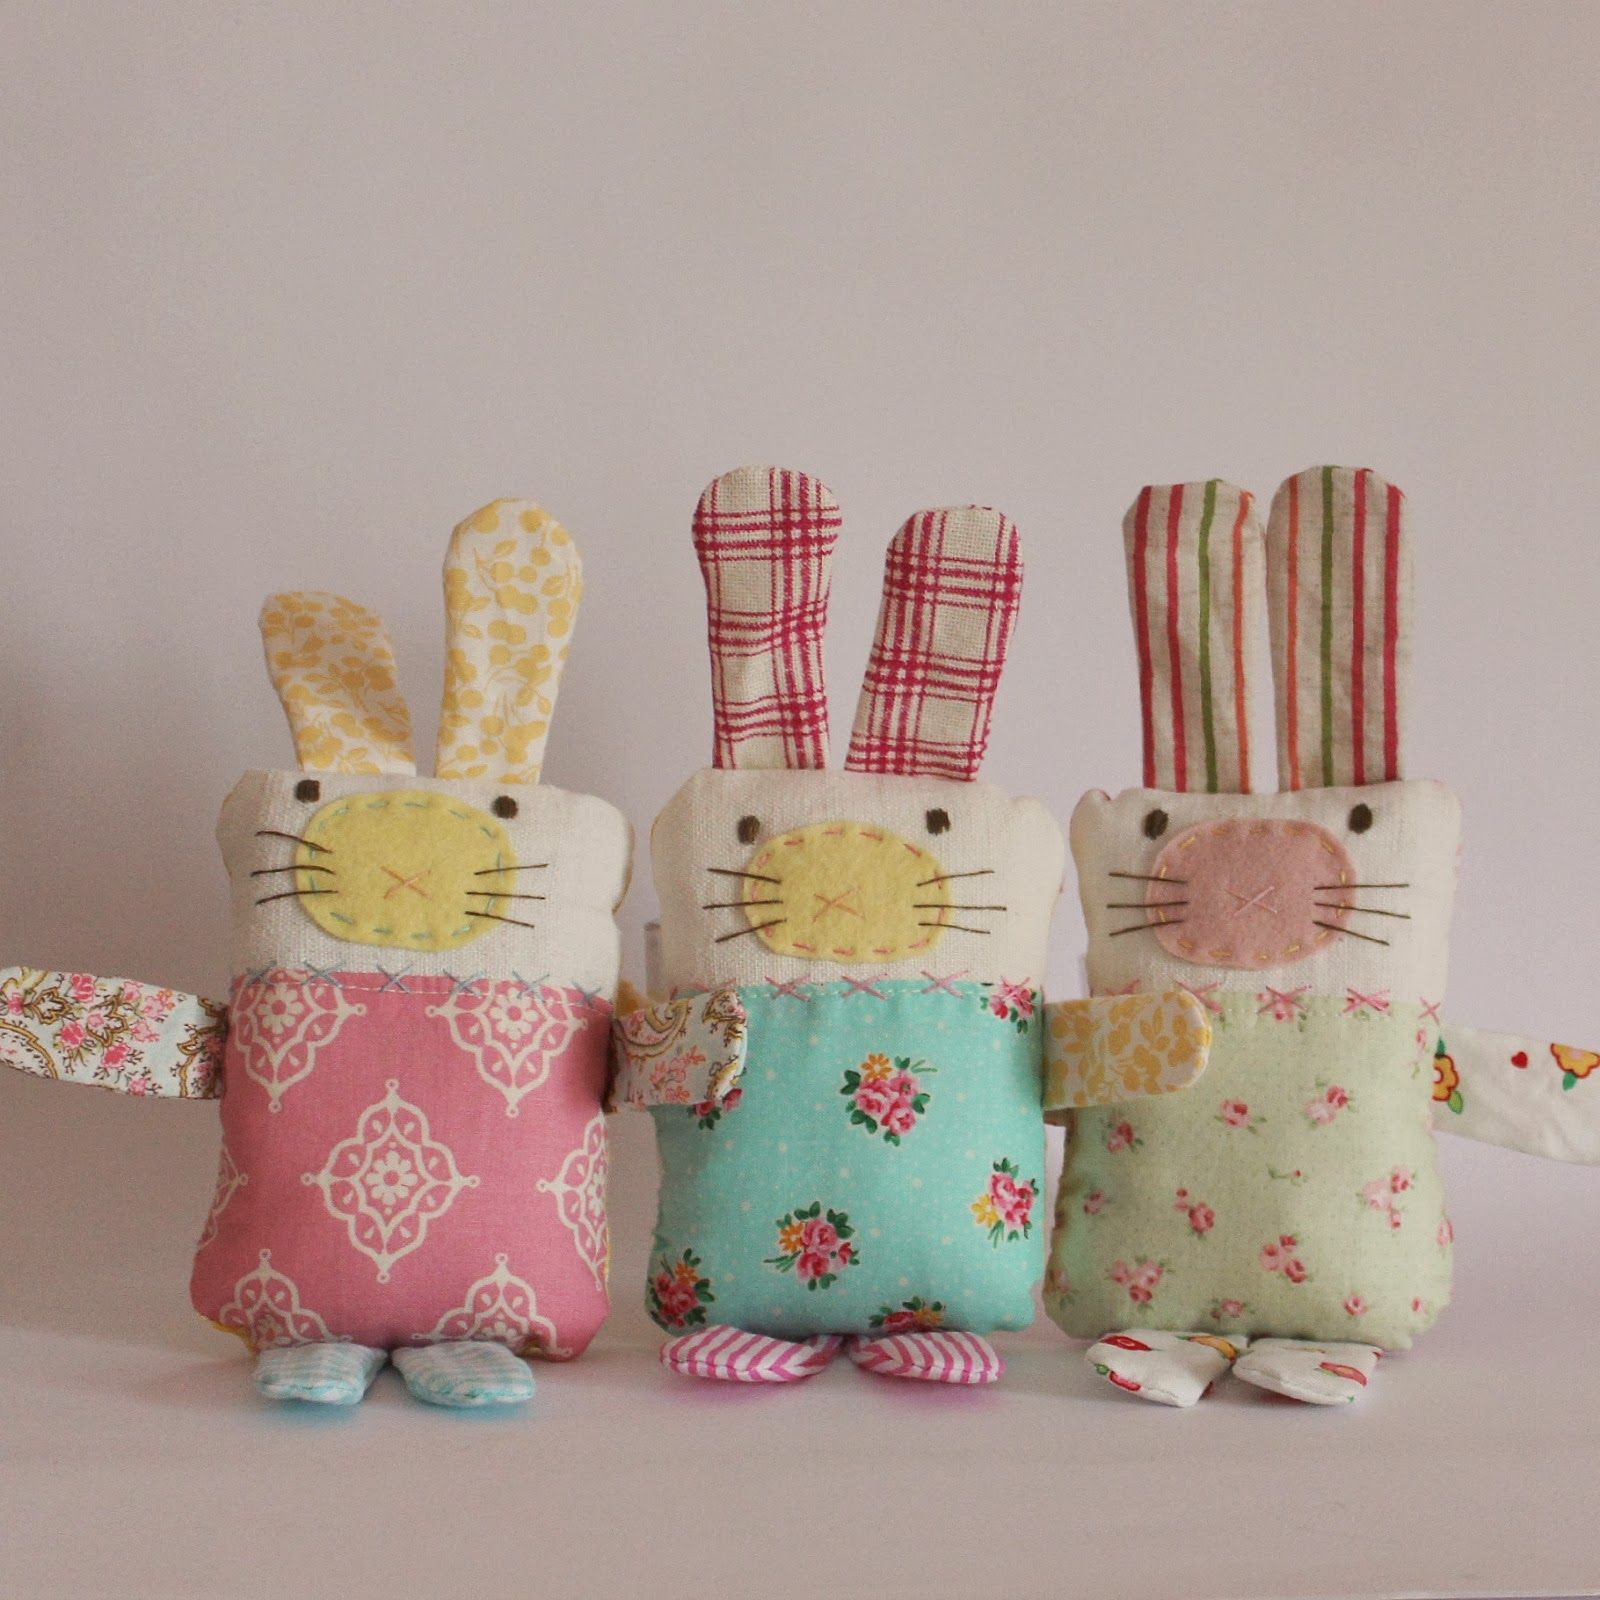 Roxy creations sweet easter bunny bags softies handmade roxy creations sweet easter bunny bags softies handmade gifts bunny pattern negle Choice Image